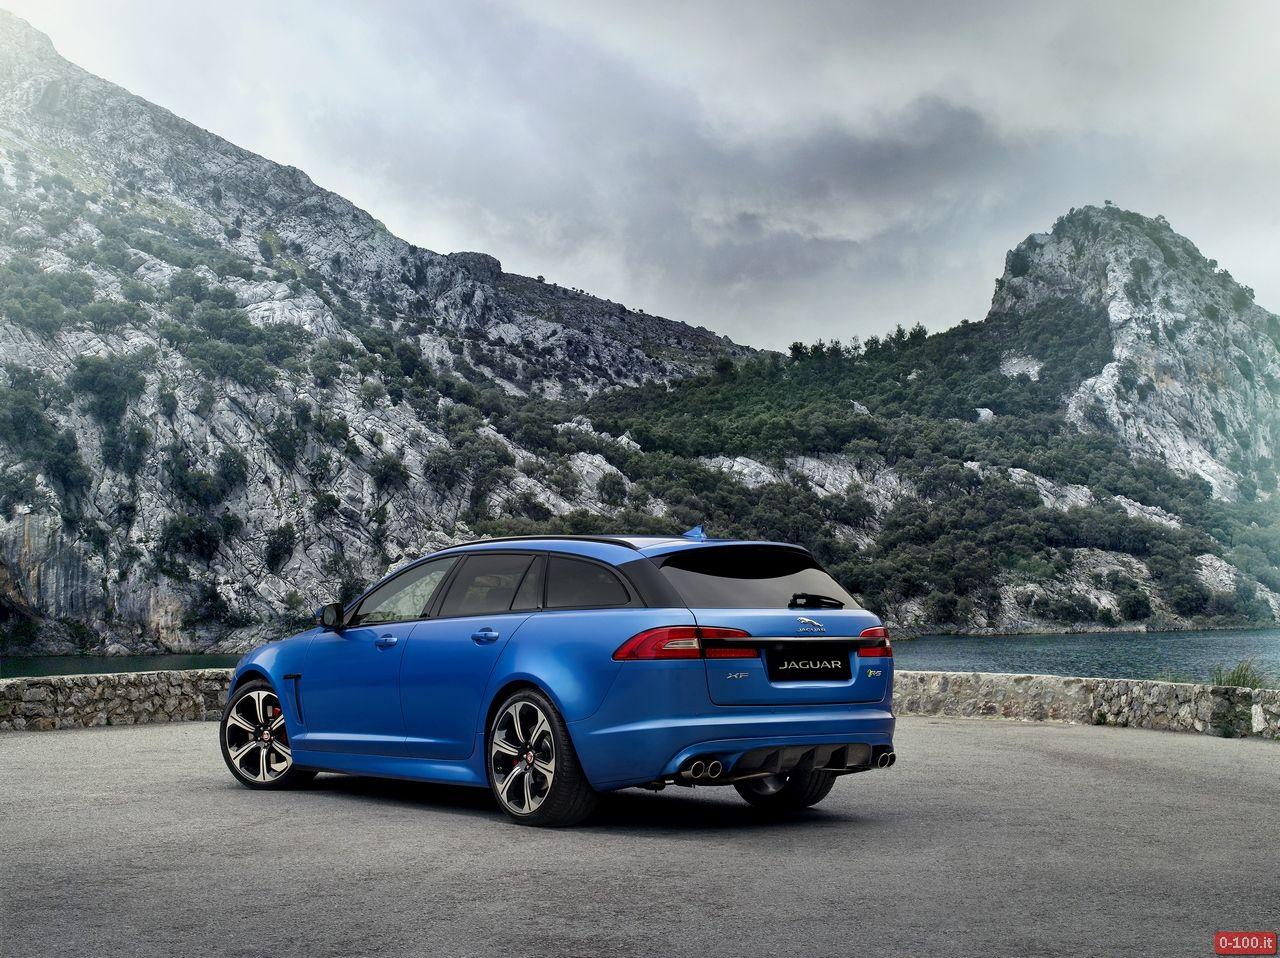 ginevra-2014-jaguar-xf-model-year-2015-xfr-s-sportbrake-0-100_13